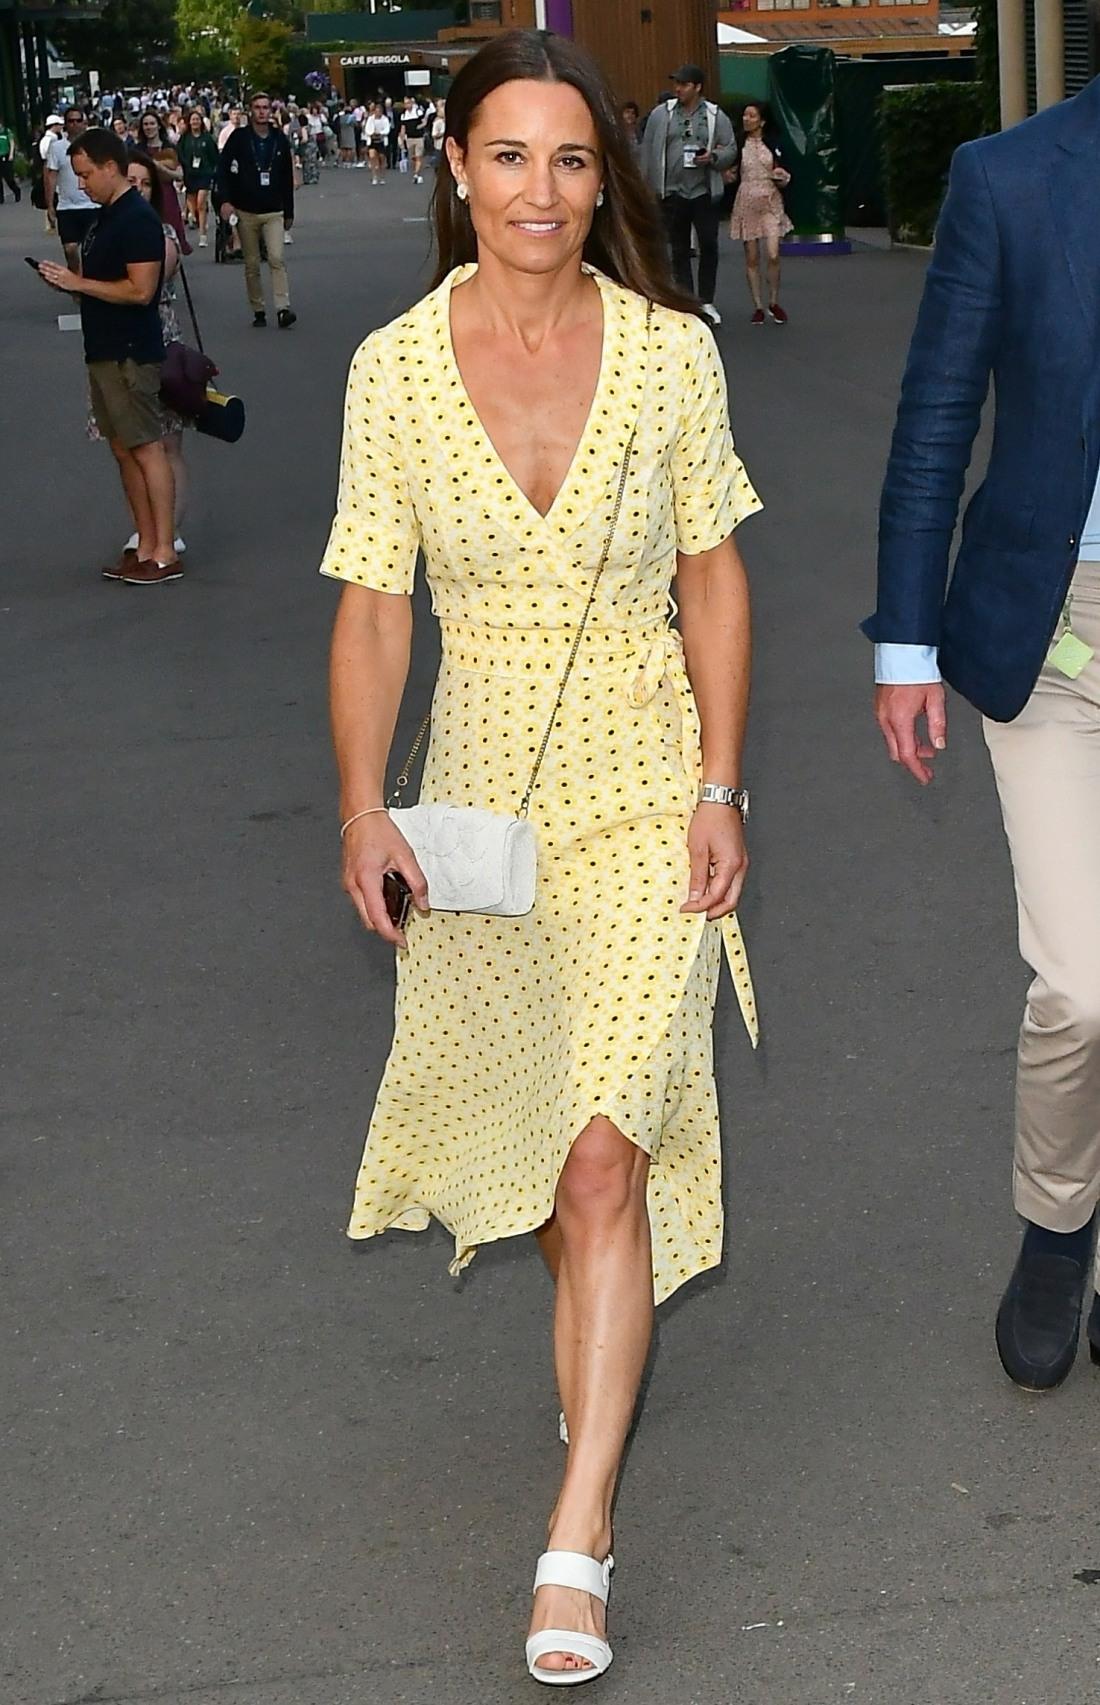 Pippa Middleton and James Matthews leaving Wimbledon after the men's semifinals